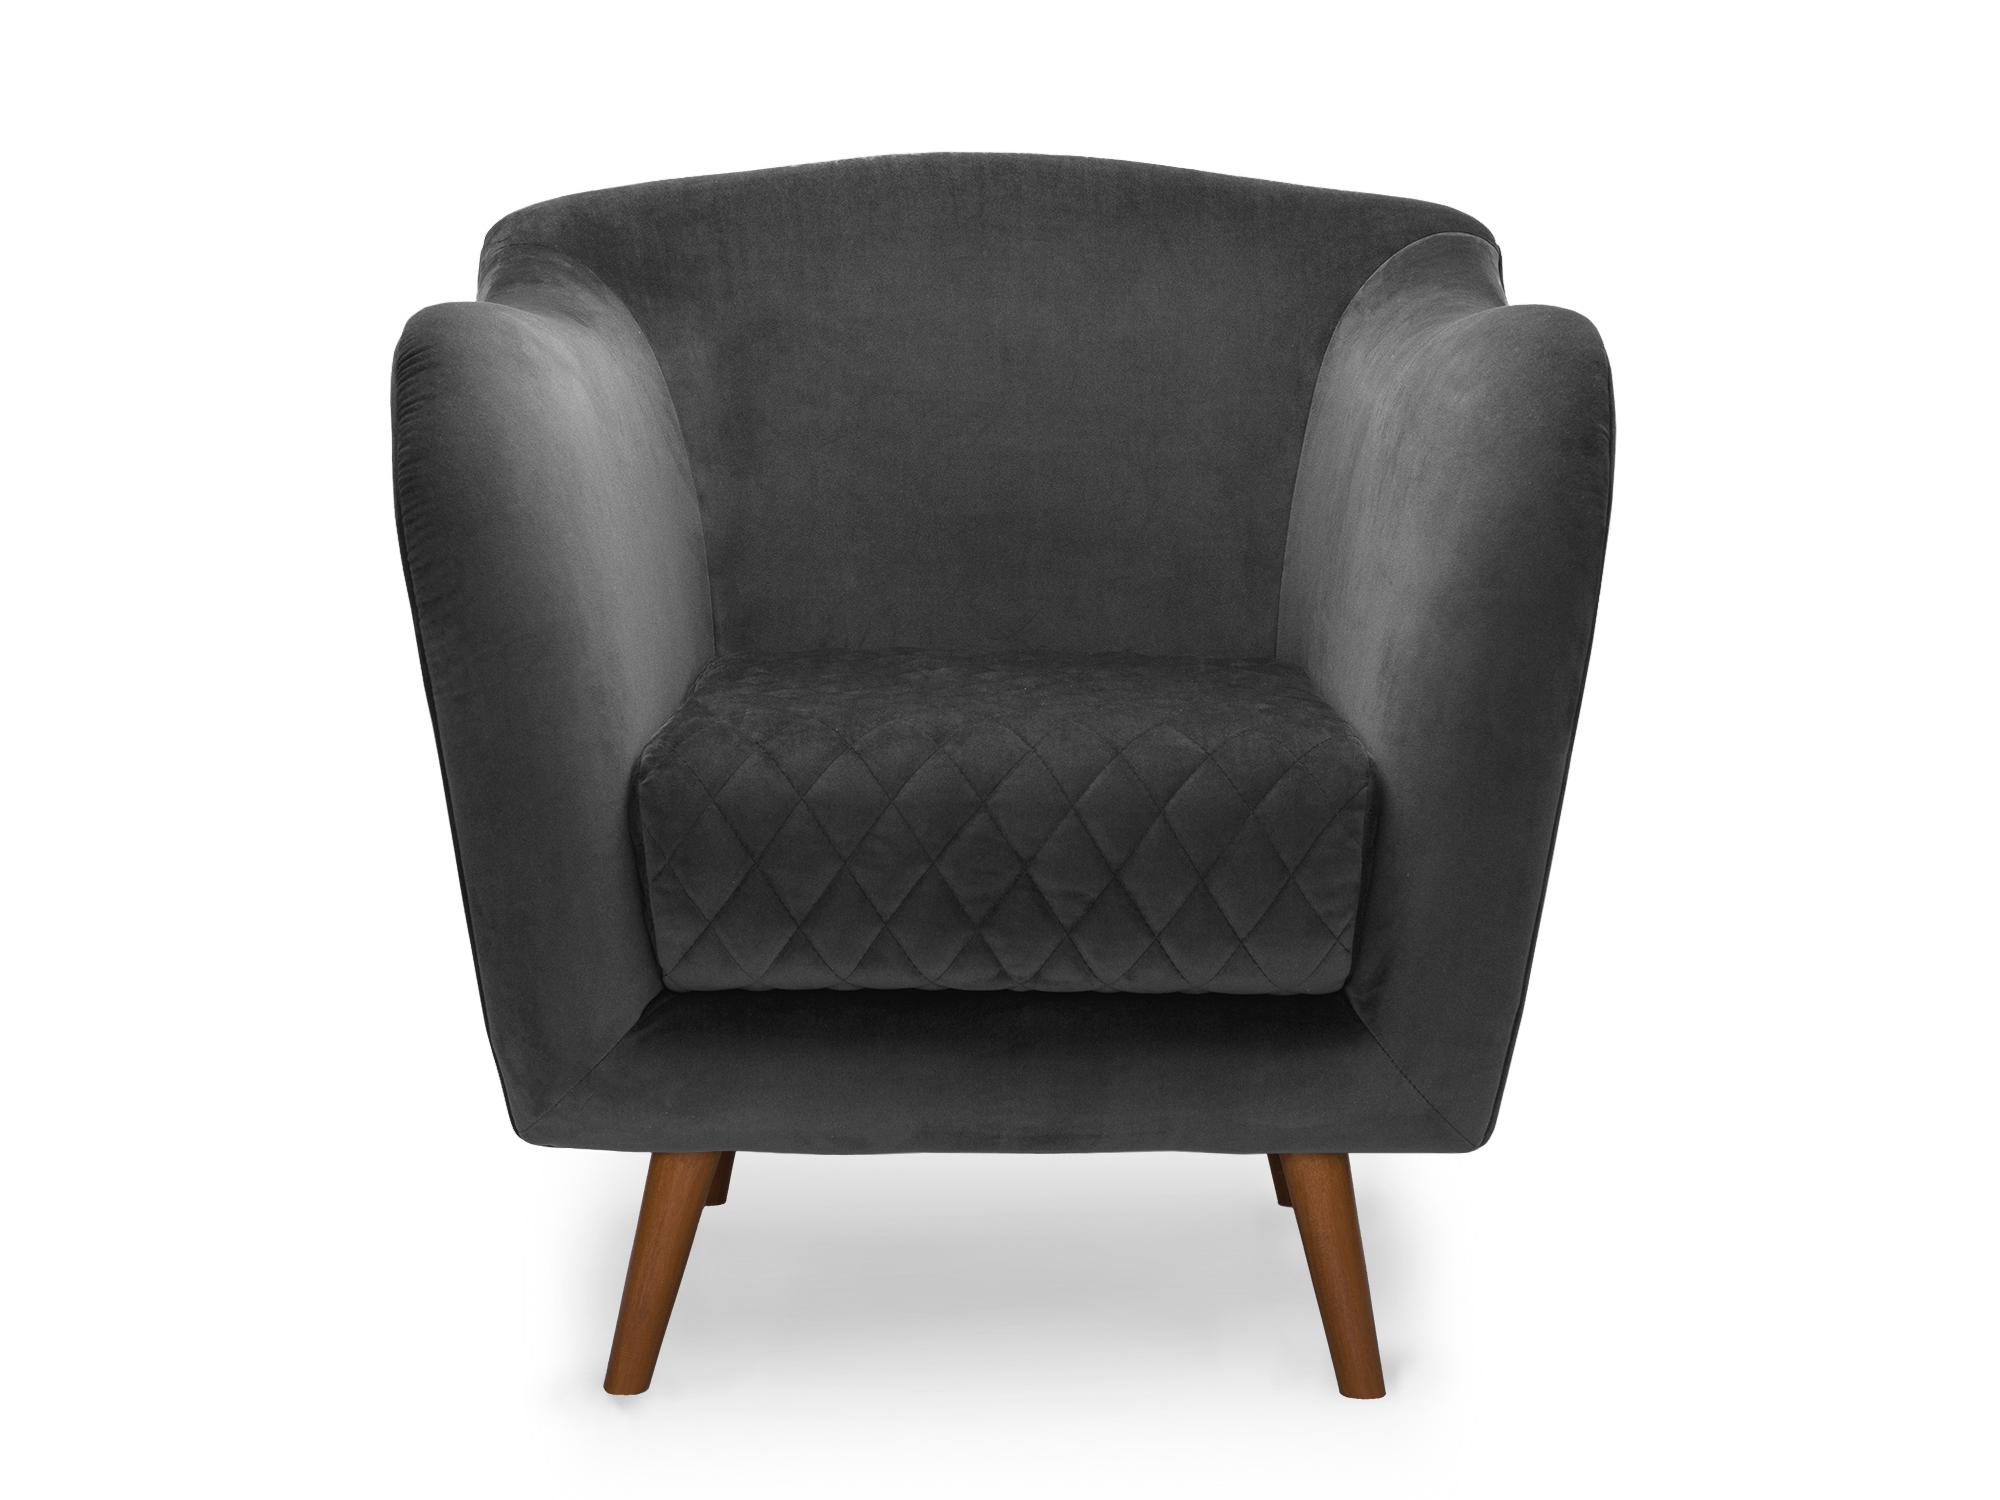 Кресло MyFurnish 15435609 от thefurnish